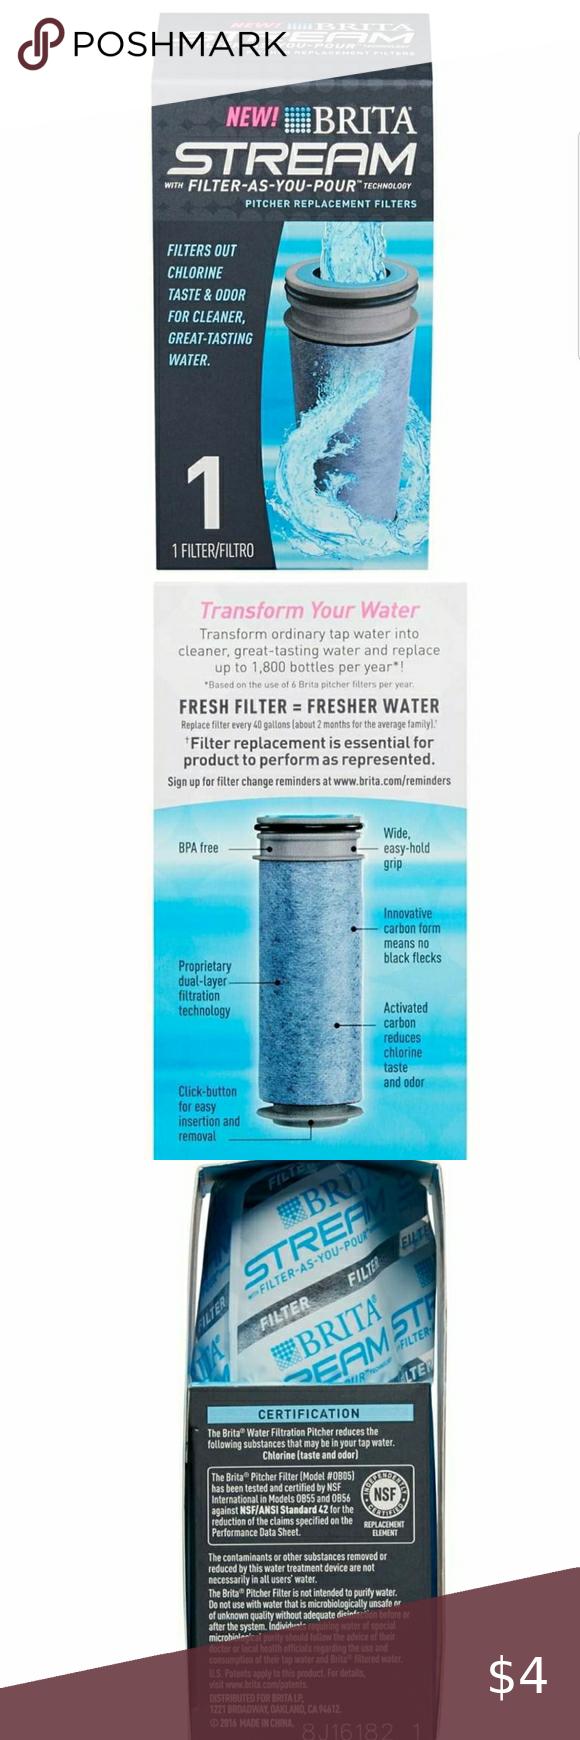 Brita Stream Pitcher Replacement Water Filter BPAfree